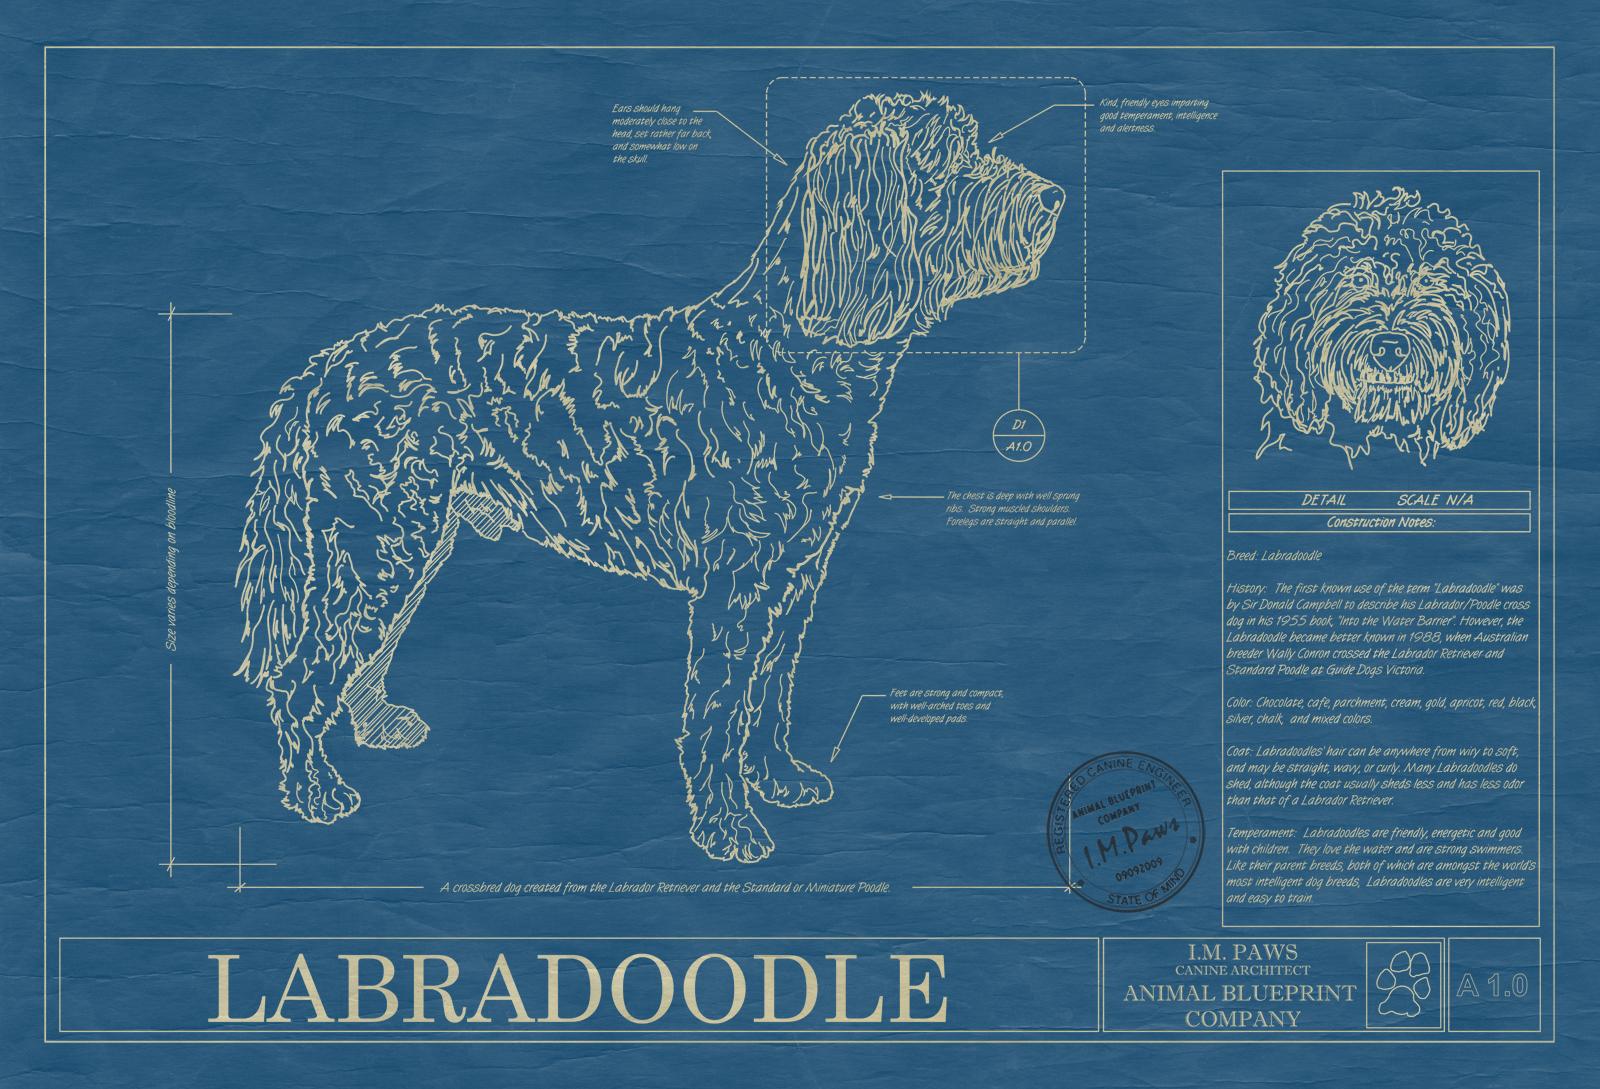 Labradoodle animal blueprint company labradoodle dog blueprint malvernweather Gallery